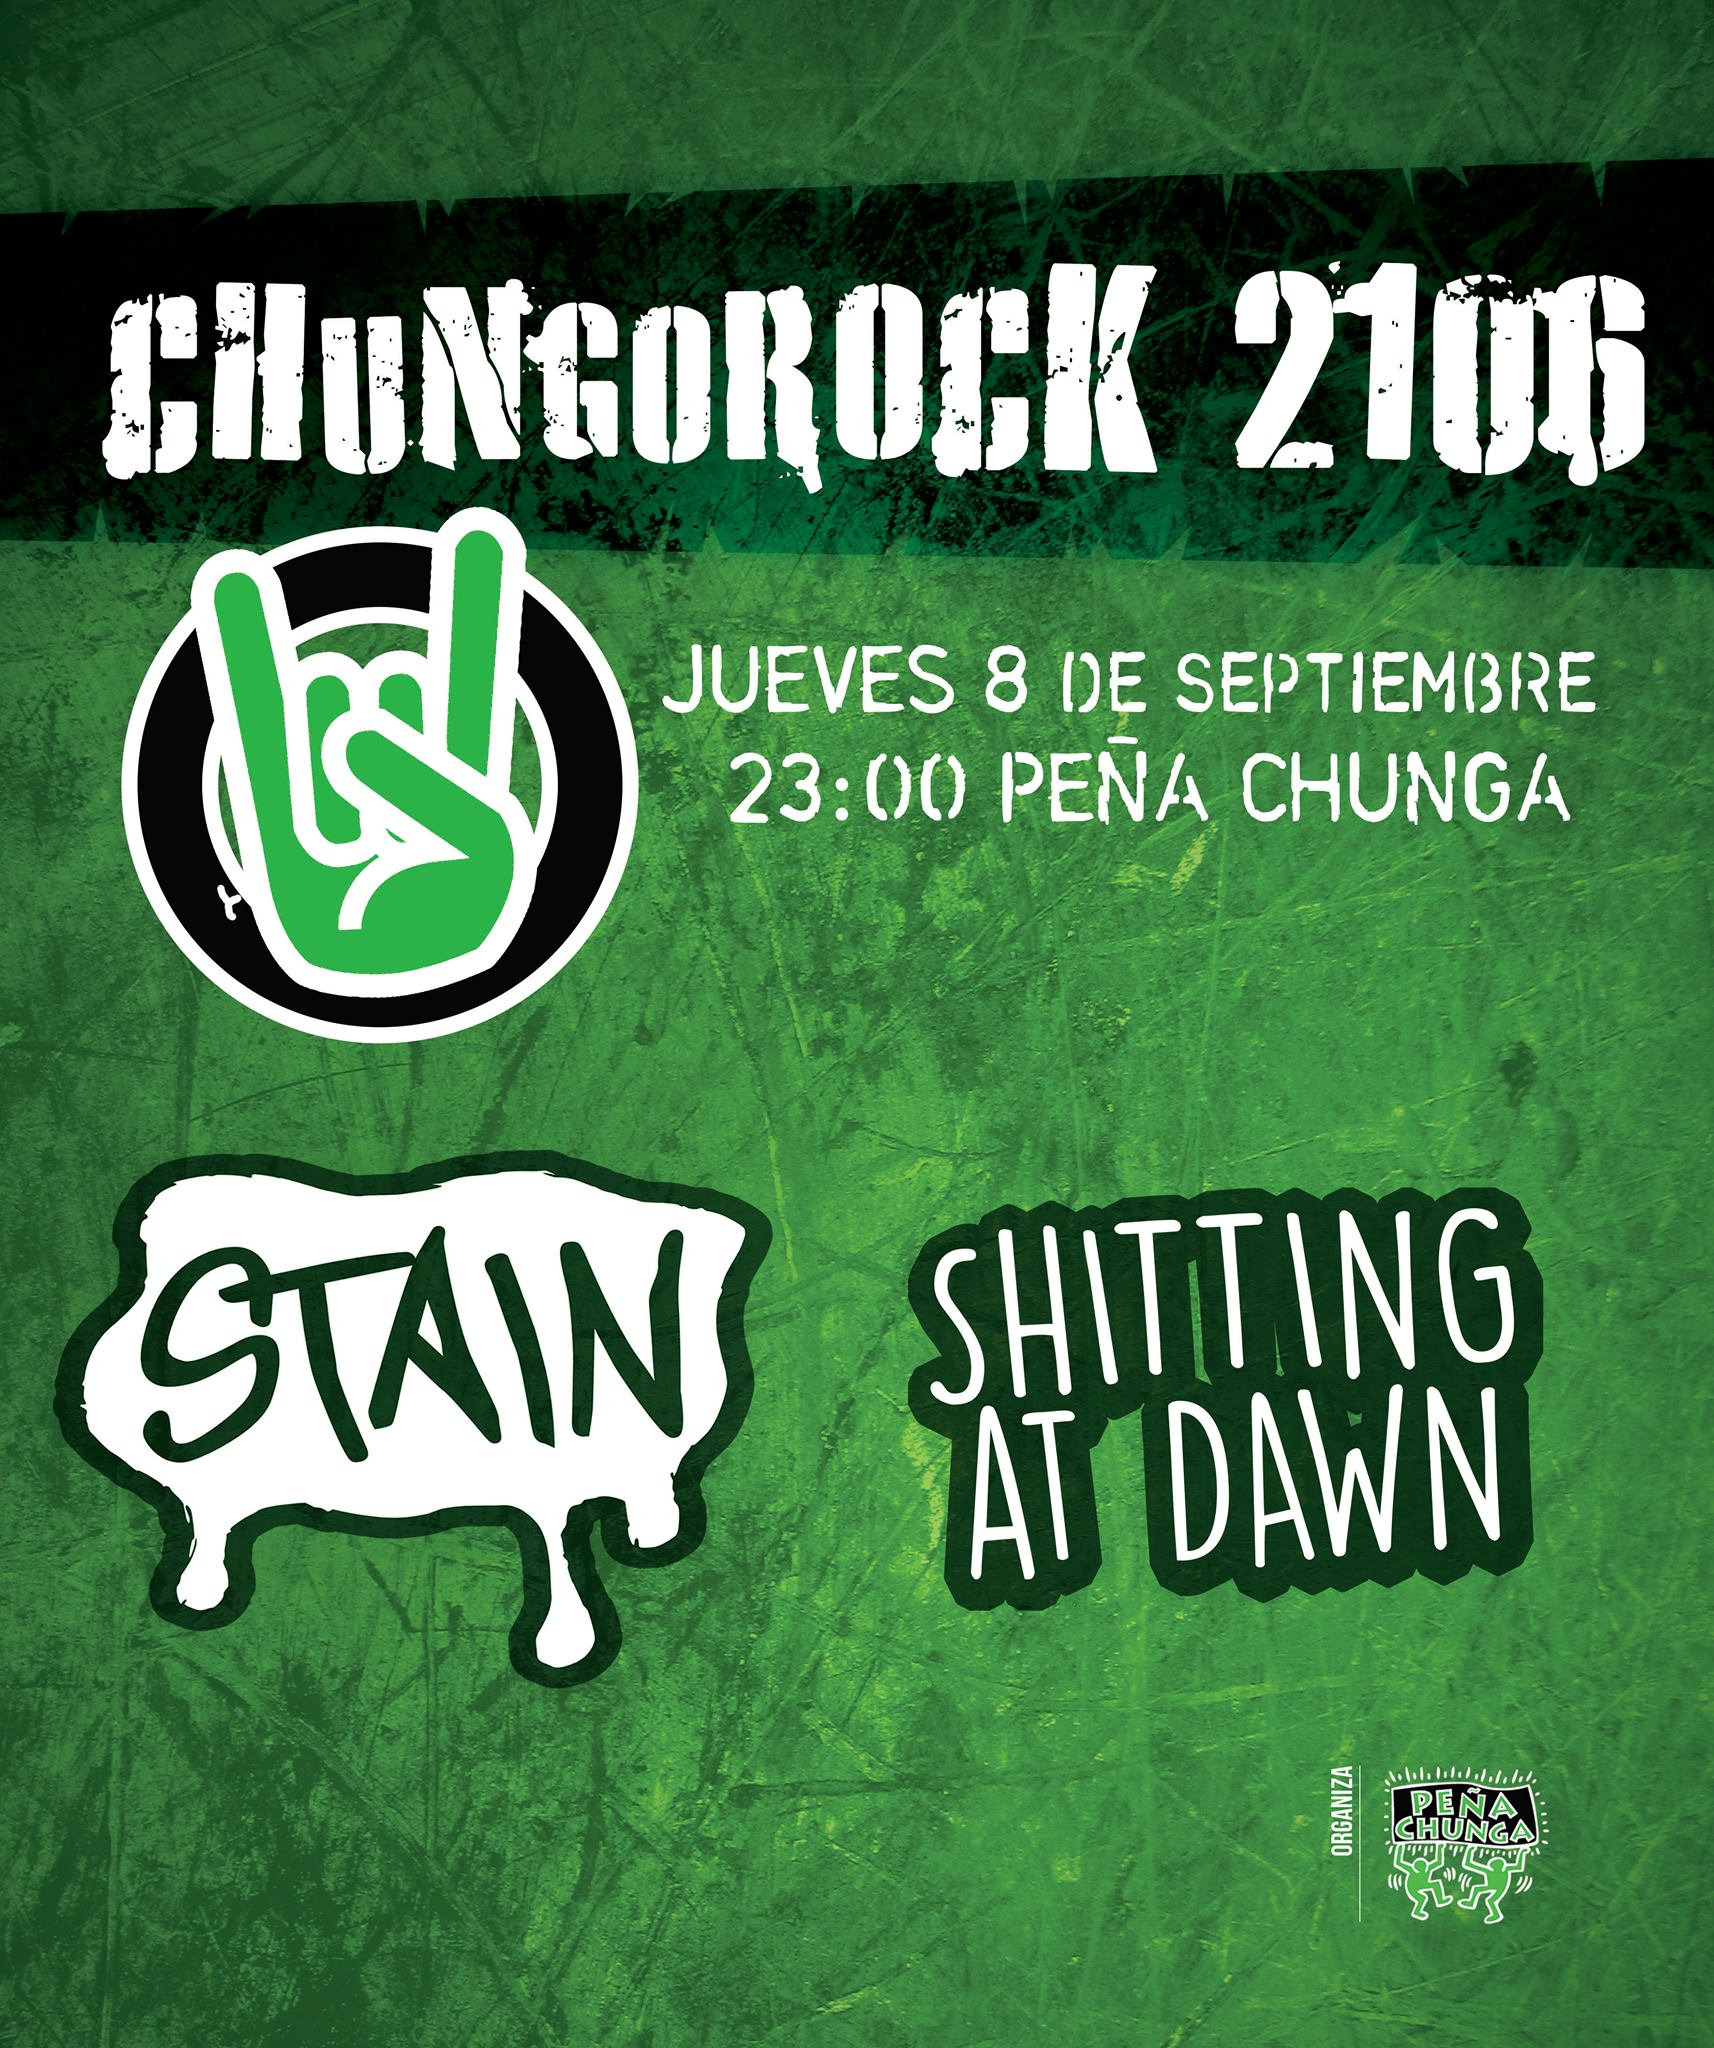 chungorock2016